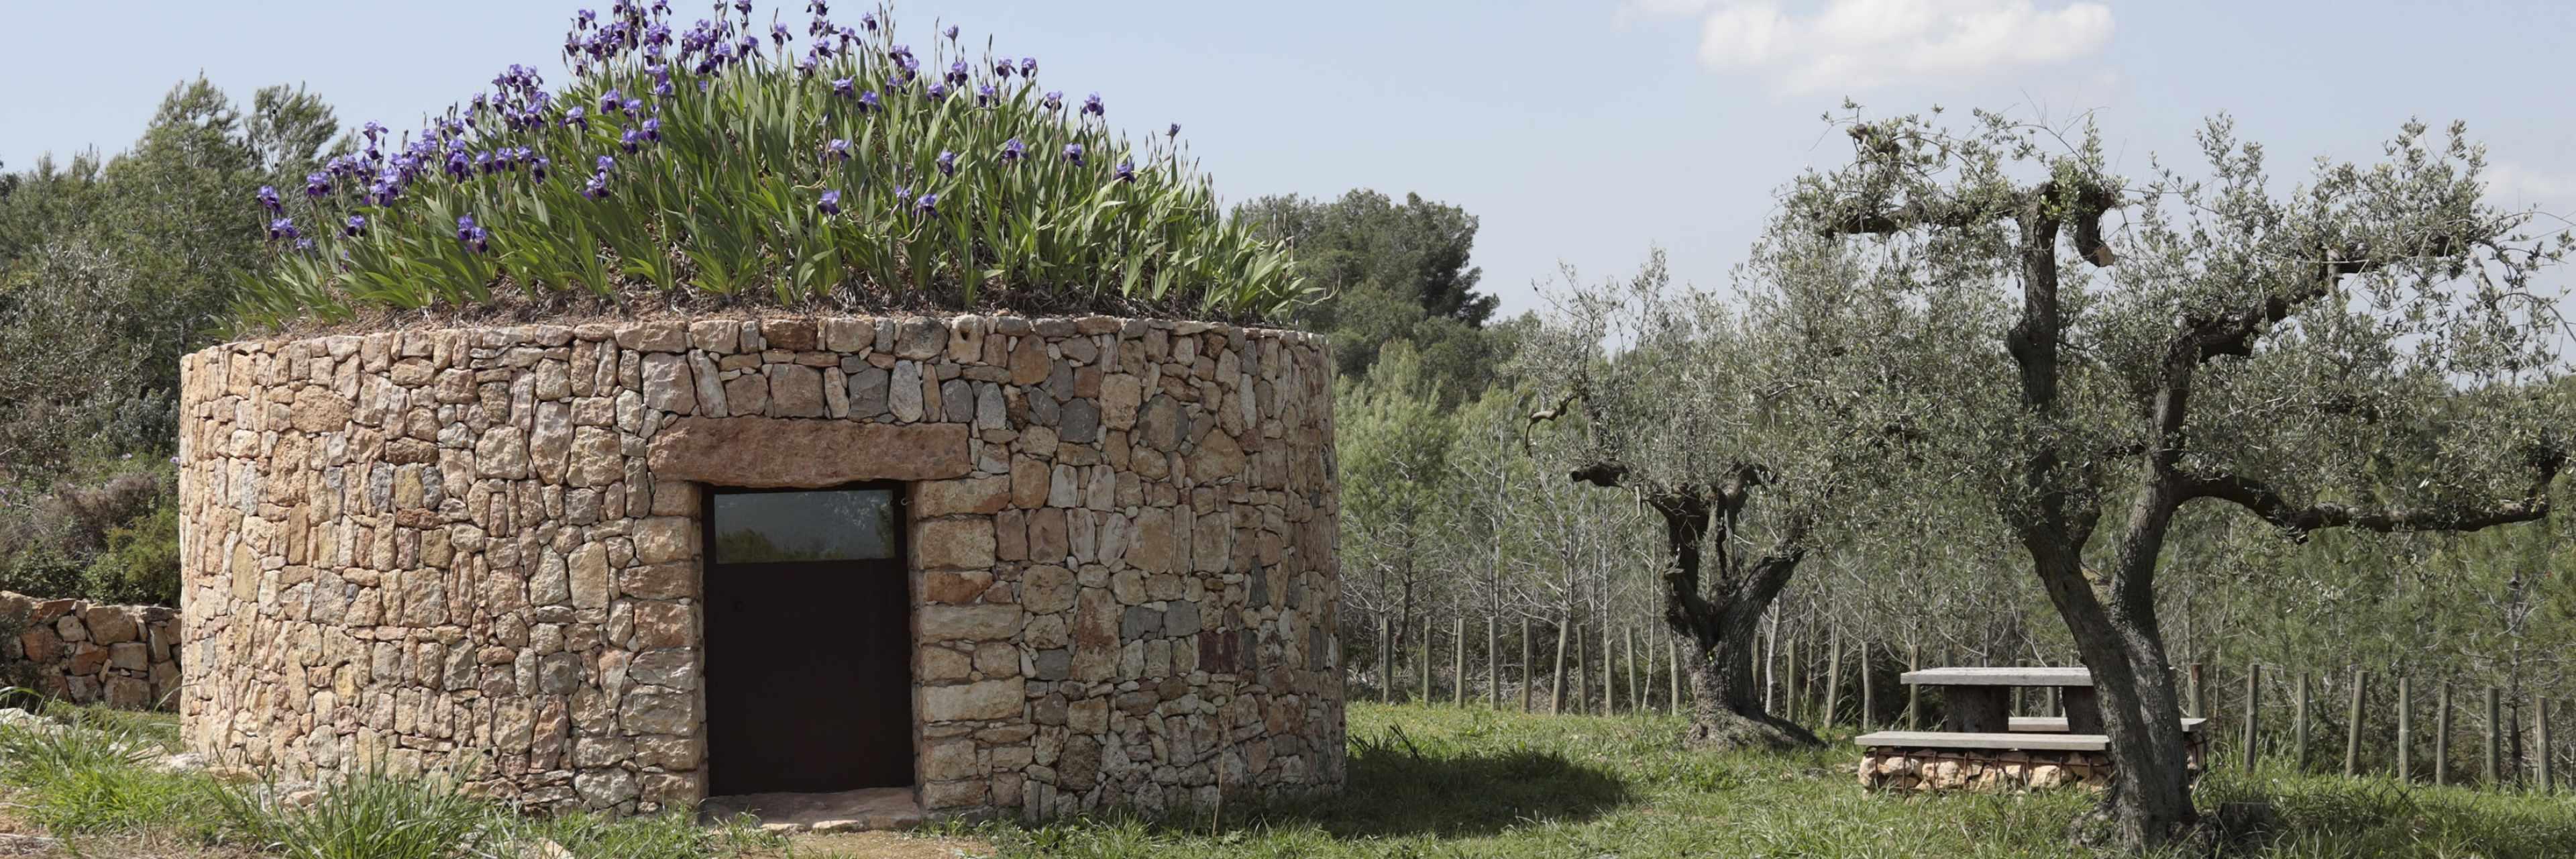 Barraca Forn